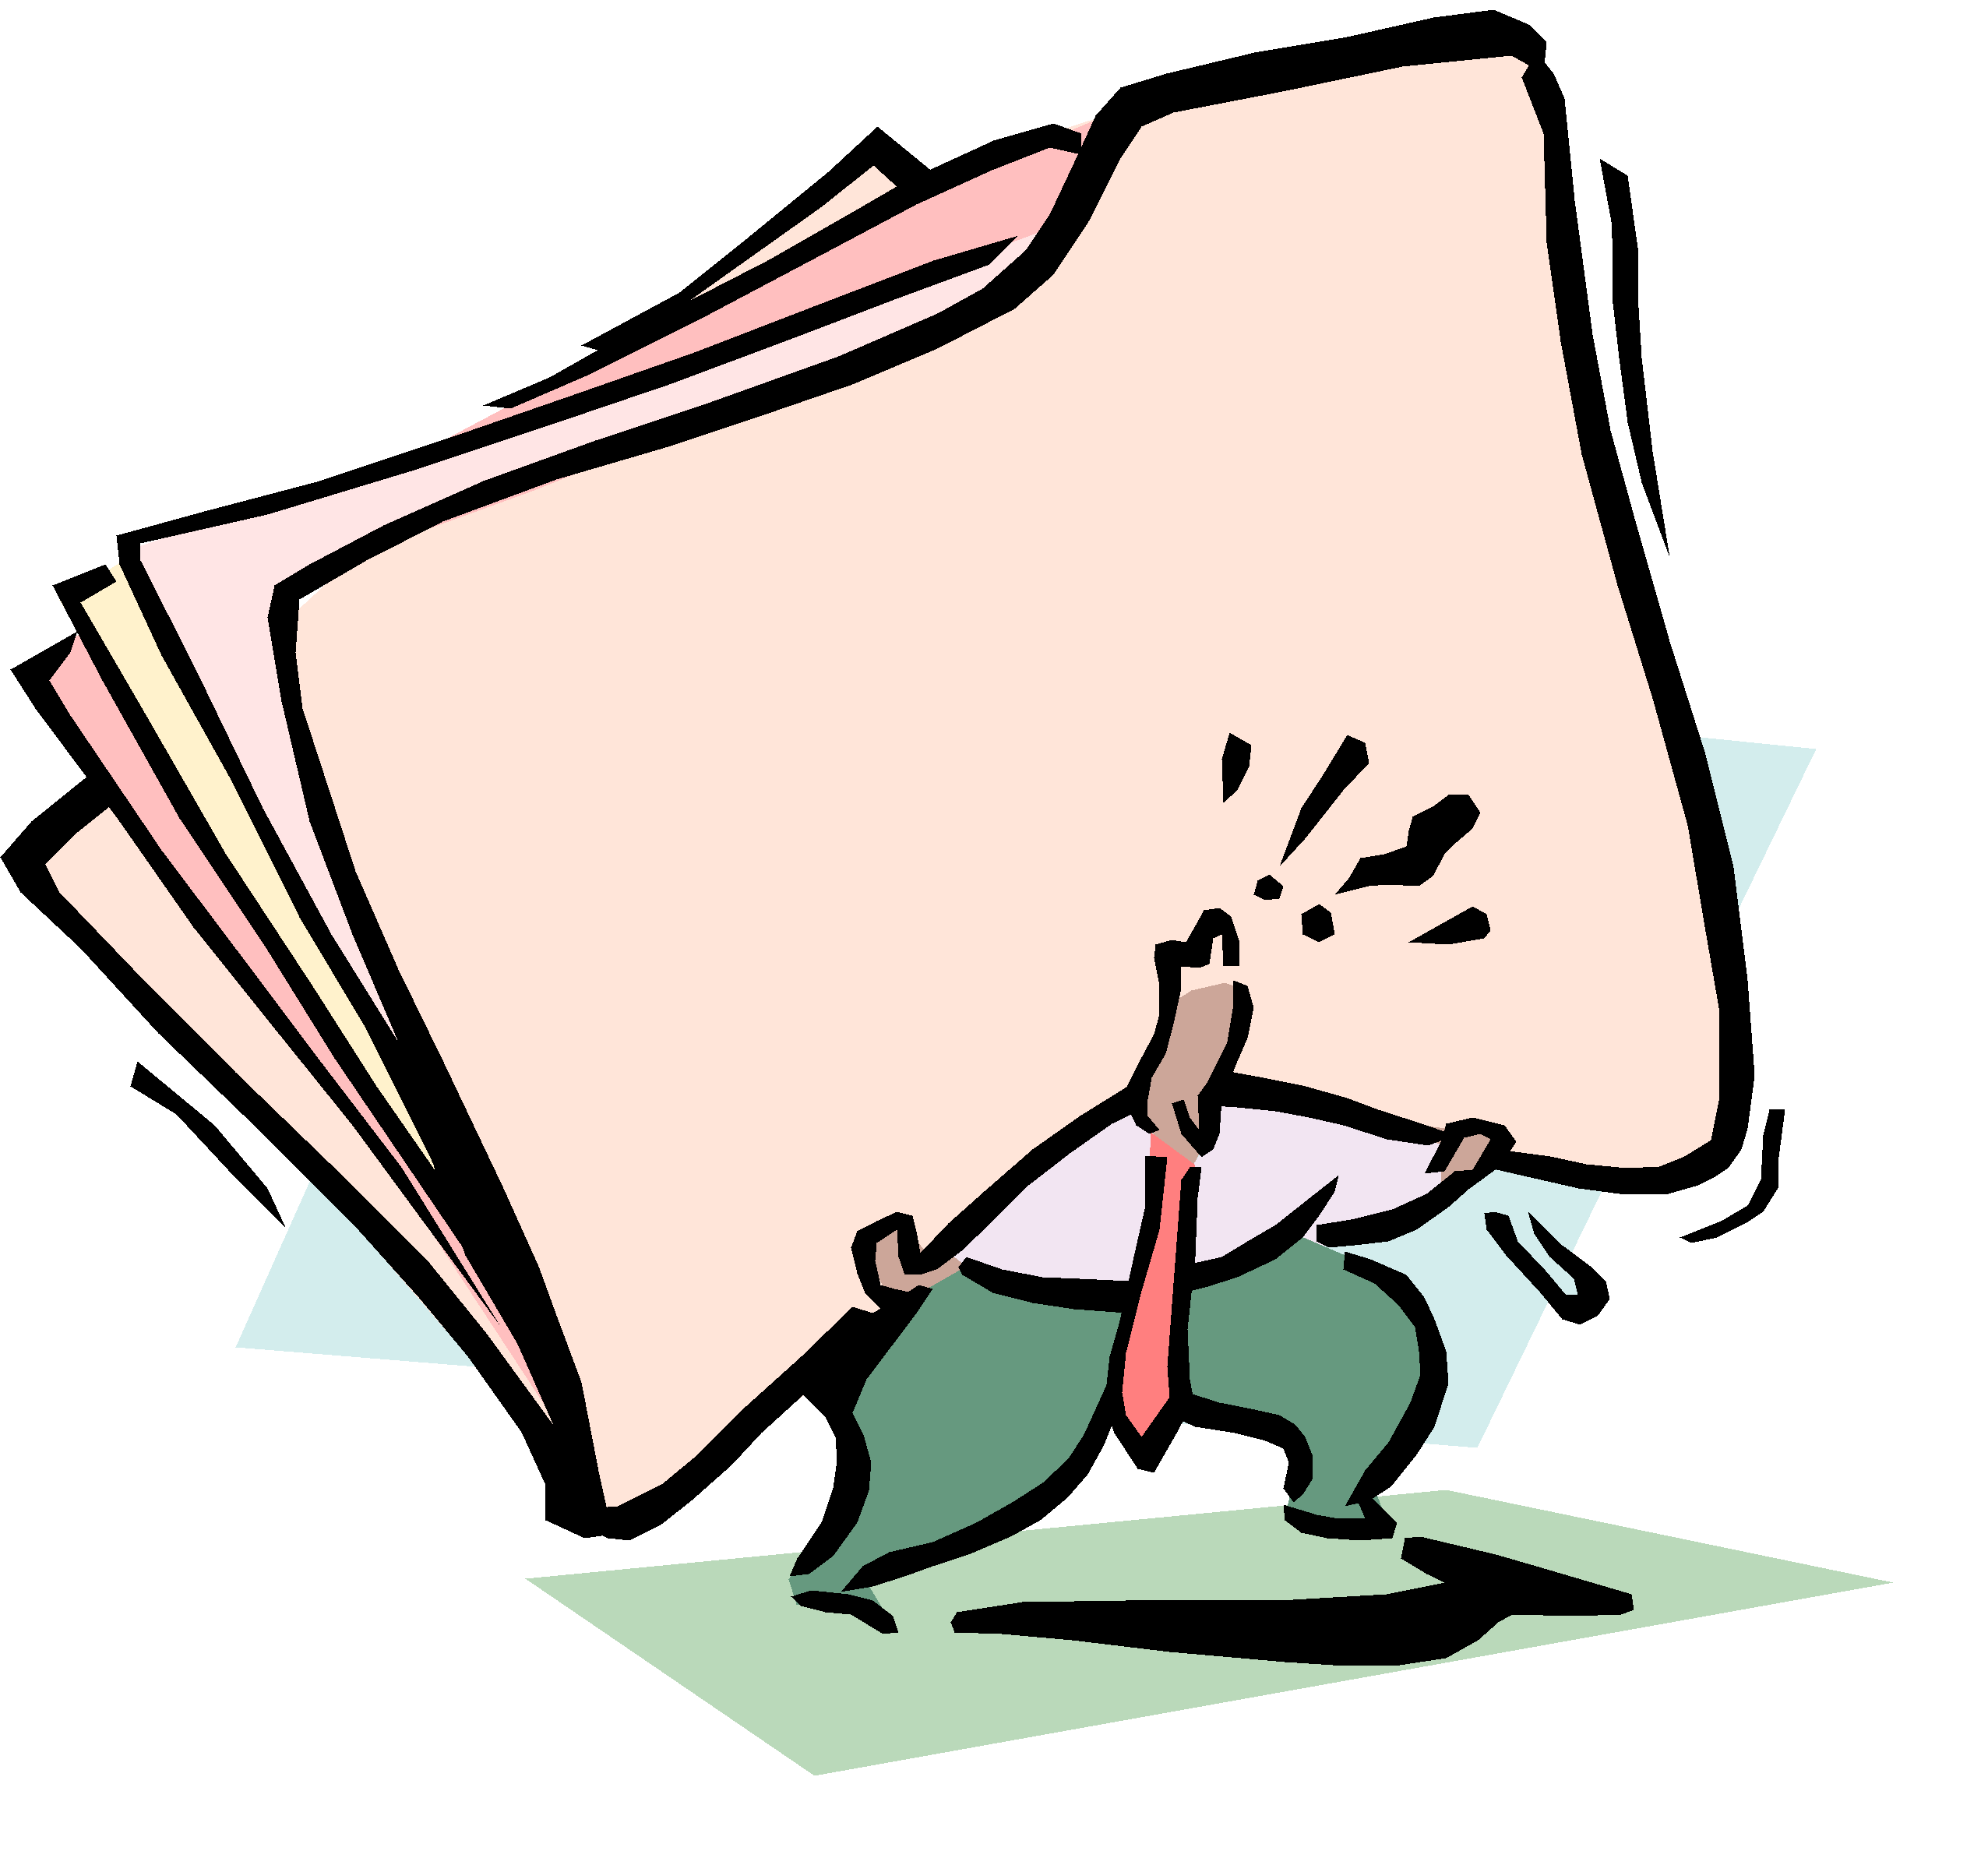 Organized clipart job duty, Organized job duty Transparent.